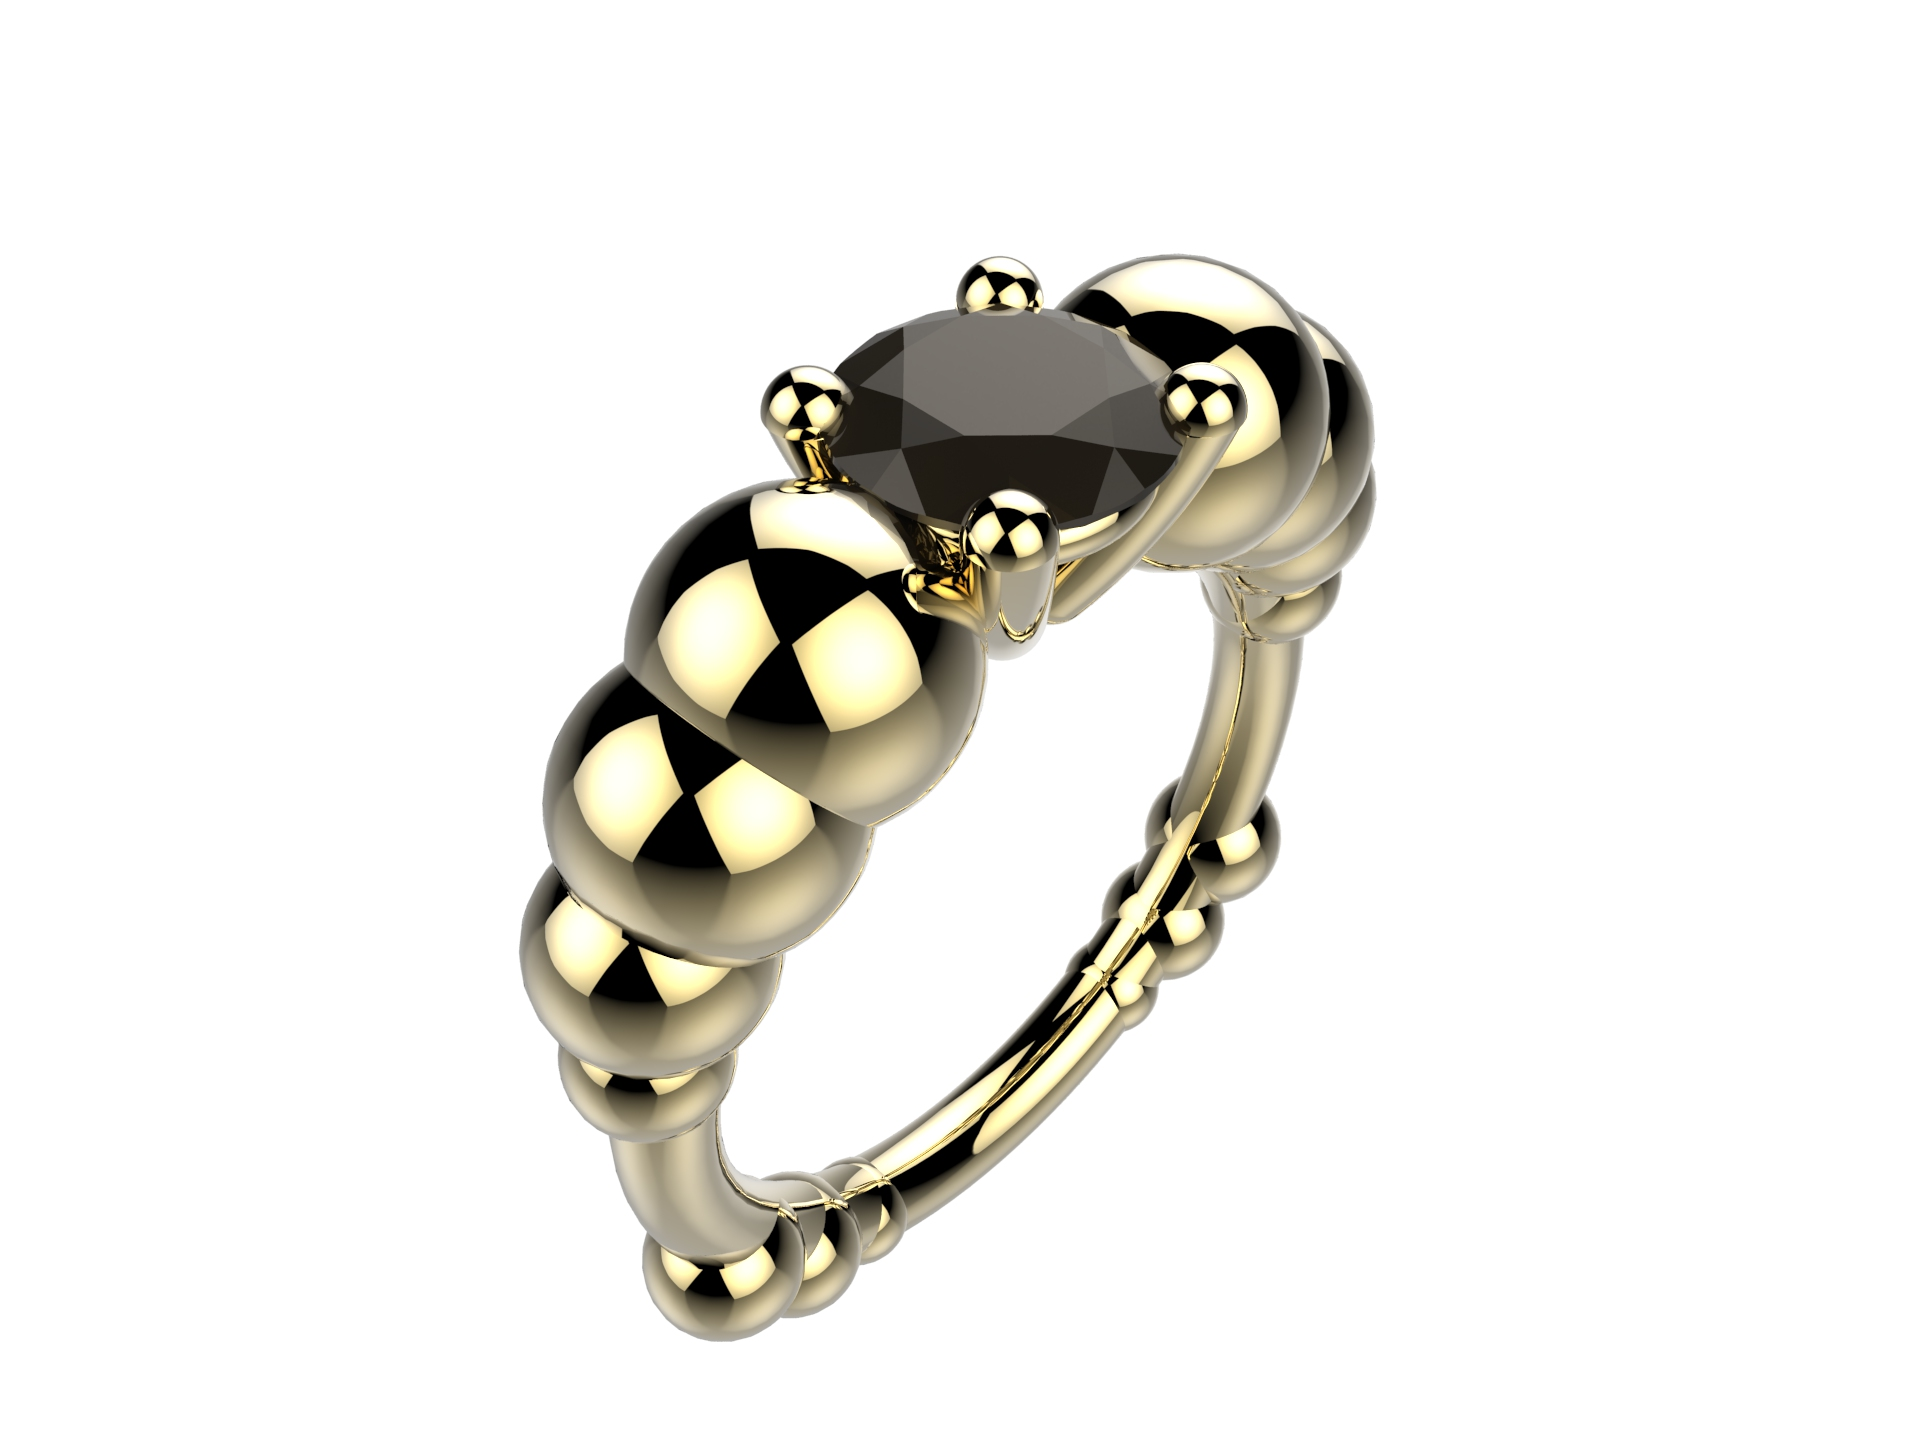 Bague or jaune diamant noir 2670 €